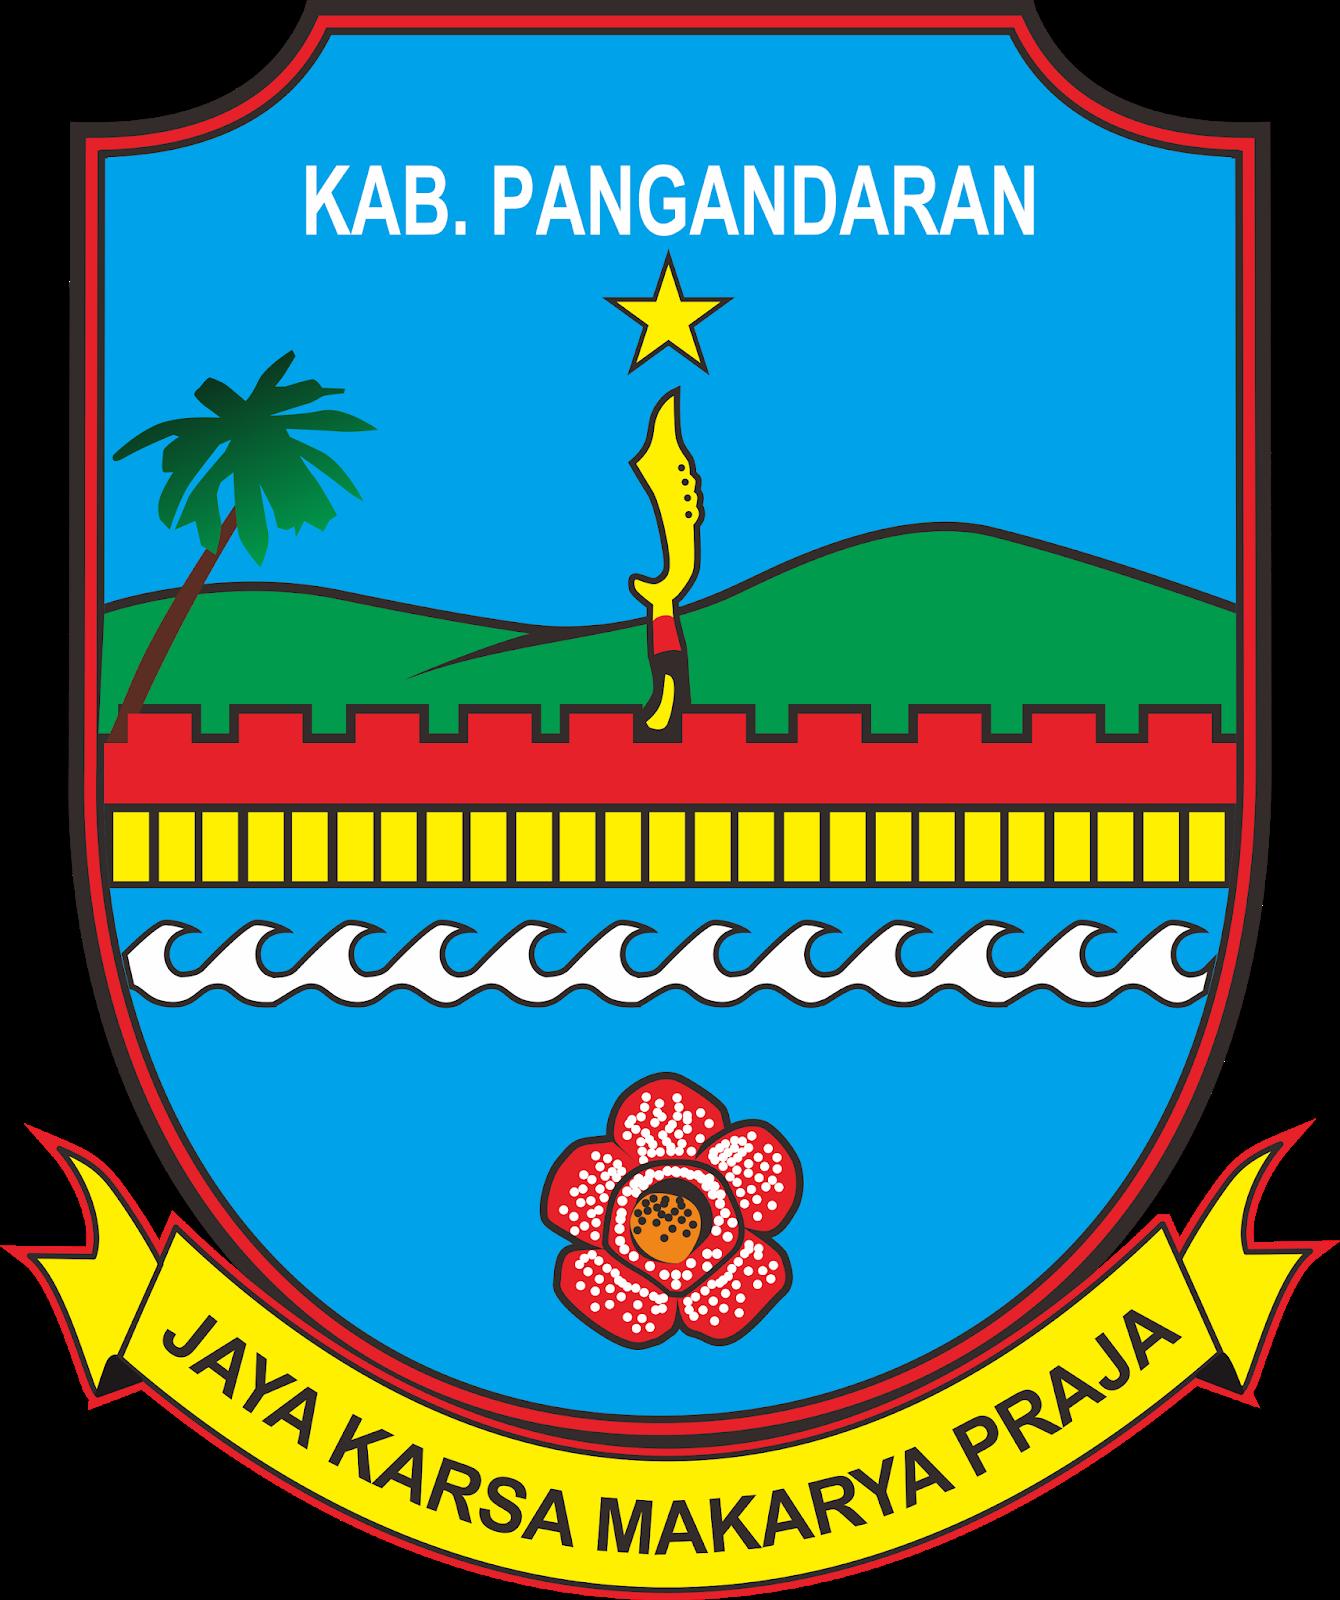 Download Logo Kabupaten Pangandaran Format Cdr Media Vector